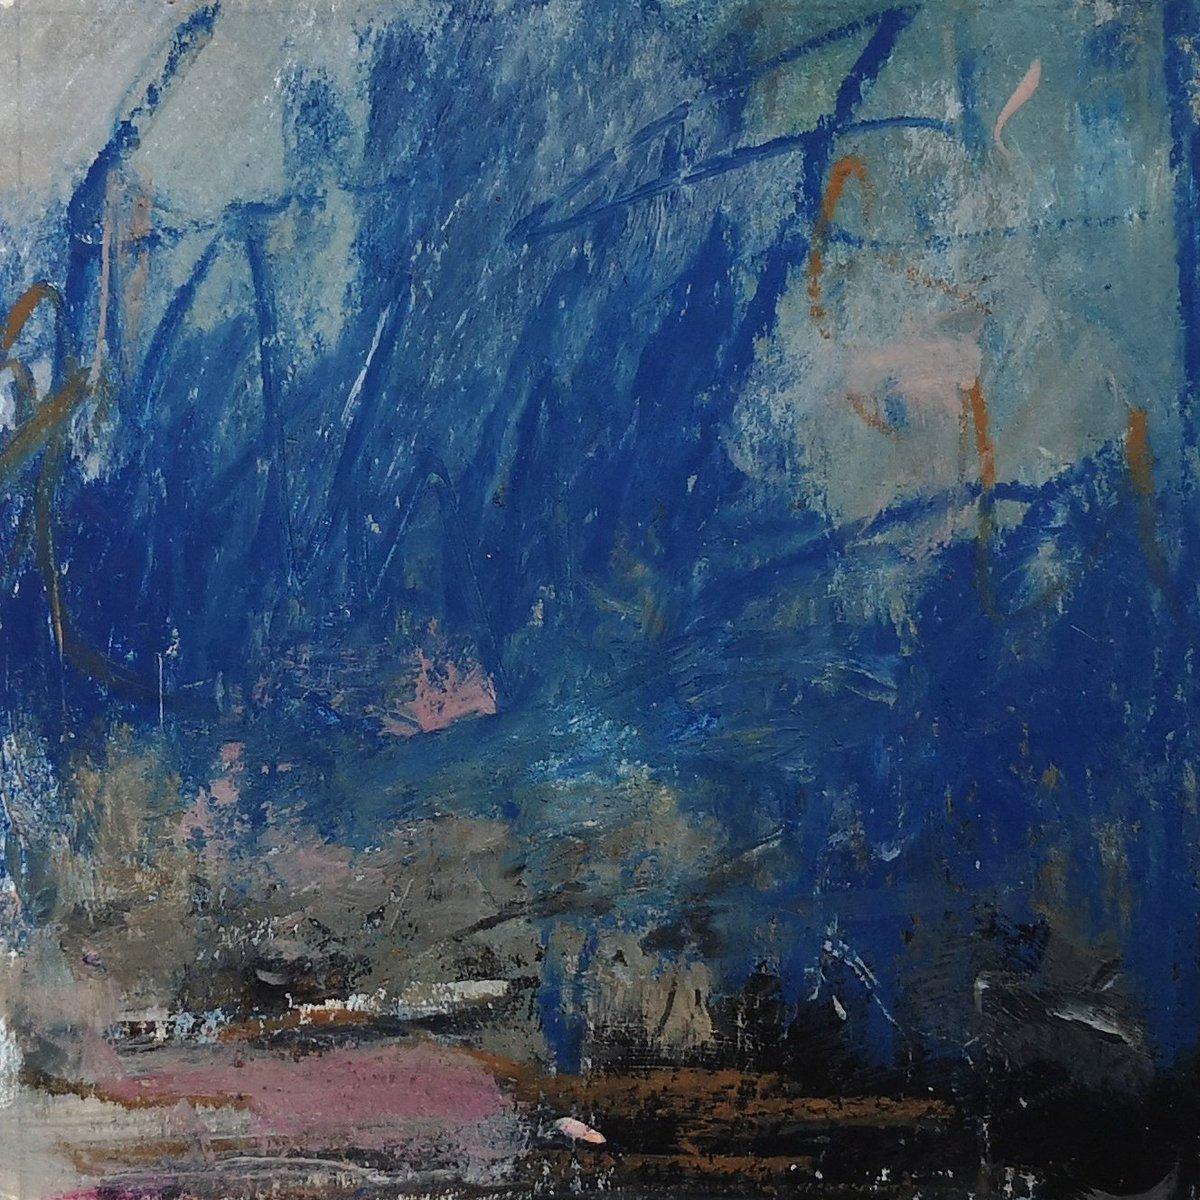 Oil pastel sketch in my sketchbook. #art #oilpastel #landfebruary #landscape #sketch #sketchbook #thedailysketch #contemporaryart #drawing #drawingofthedaypic.twitter.com/u6sRNSI0Ac